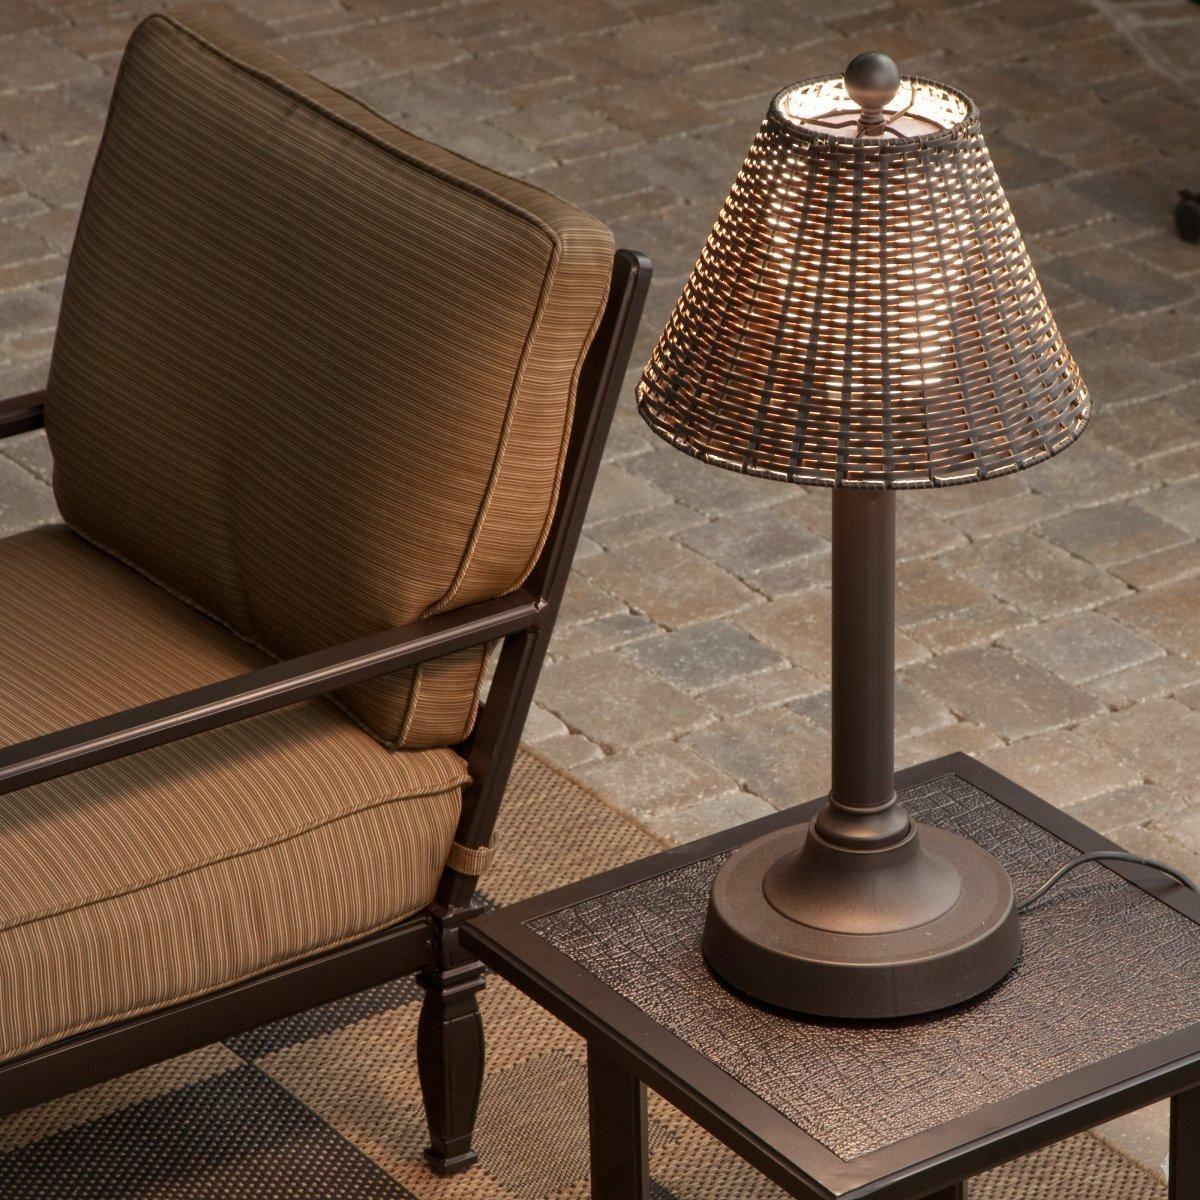 Tahti Outdoor Patio Table Lamp Outdoor Table Lamps Outdoor Patio Table Patio Table